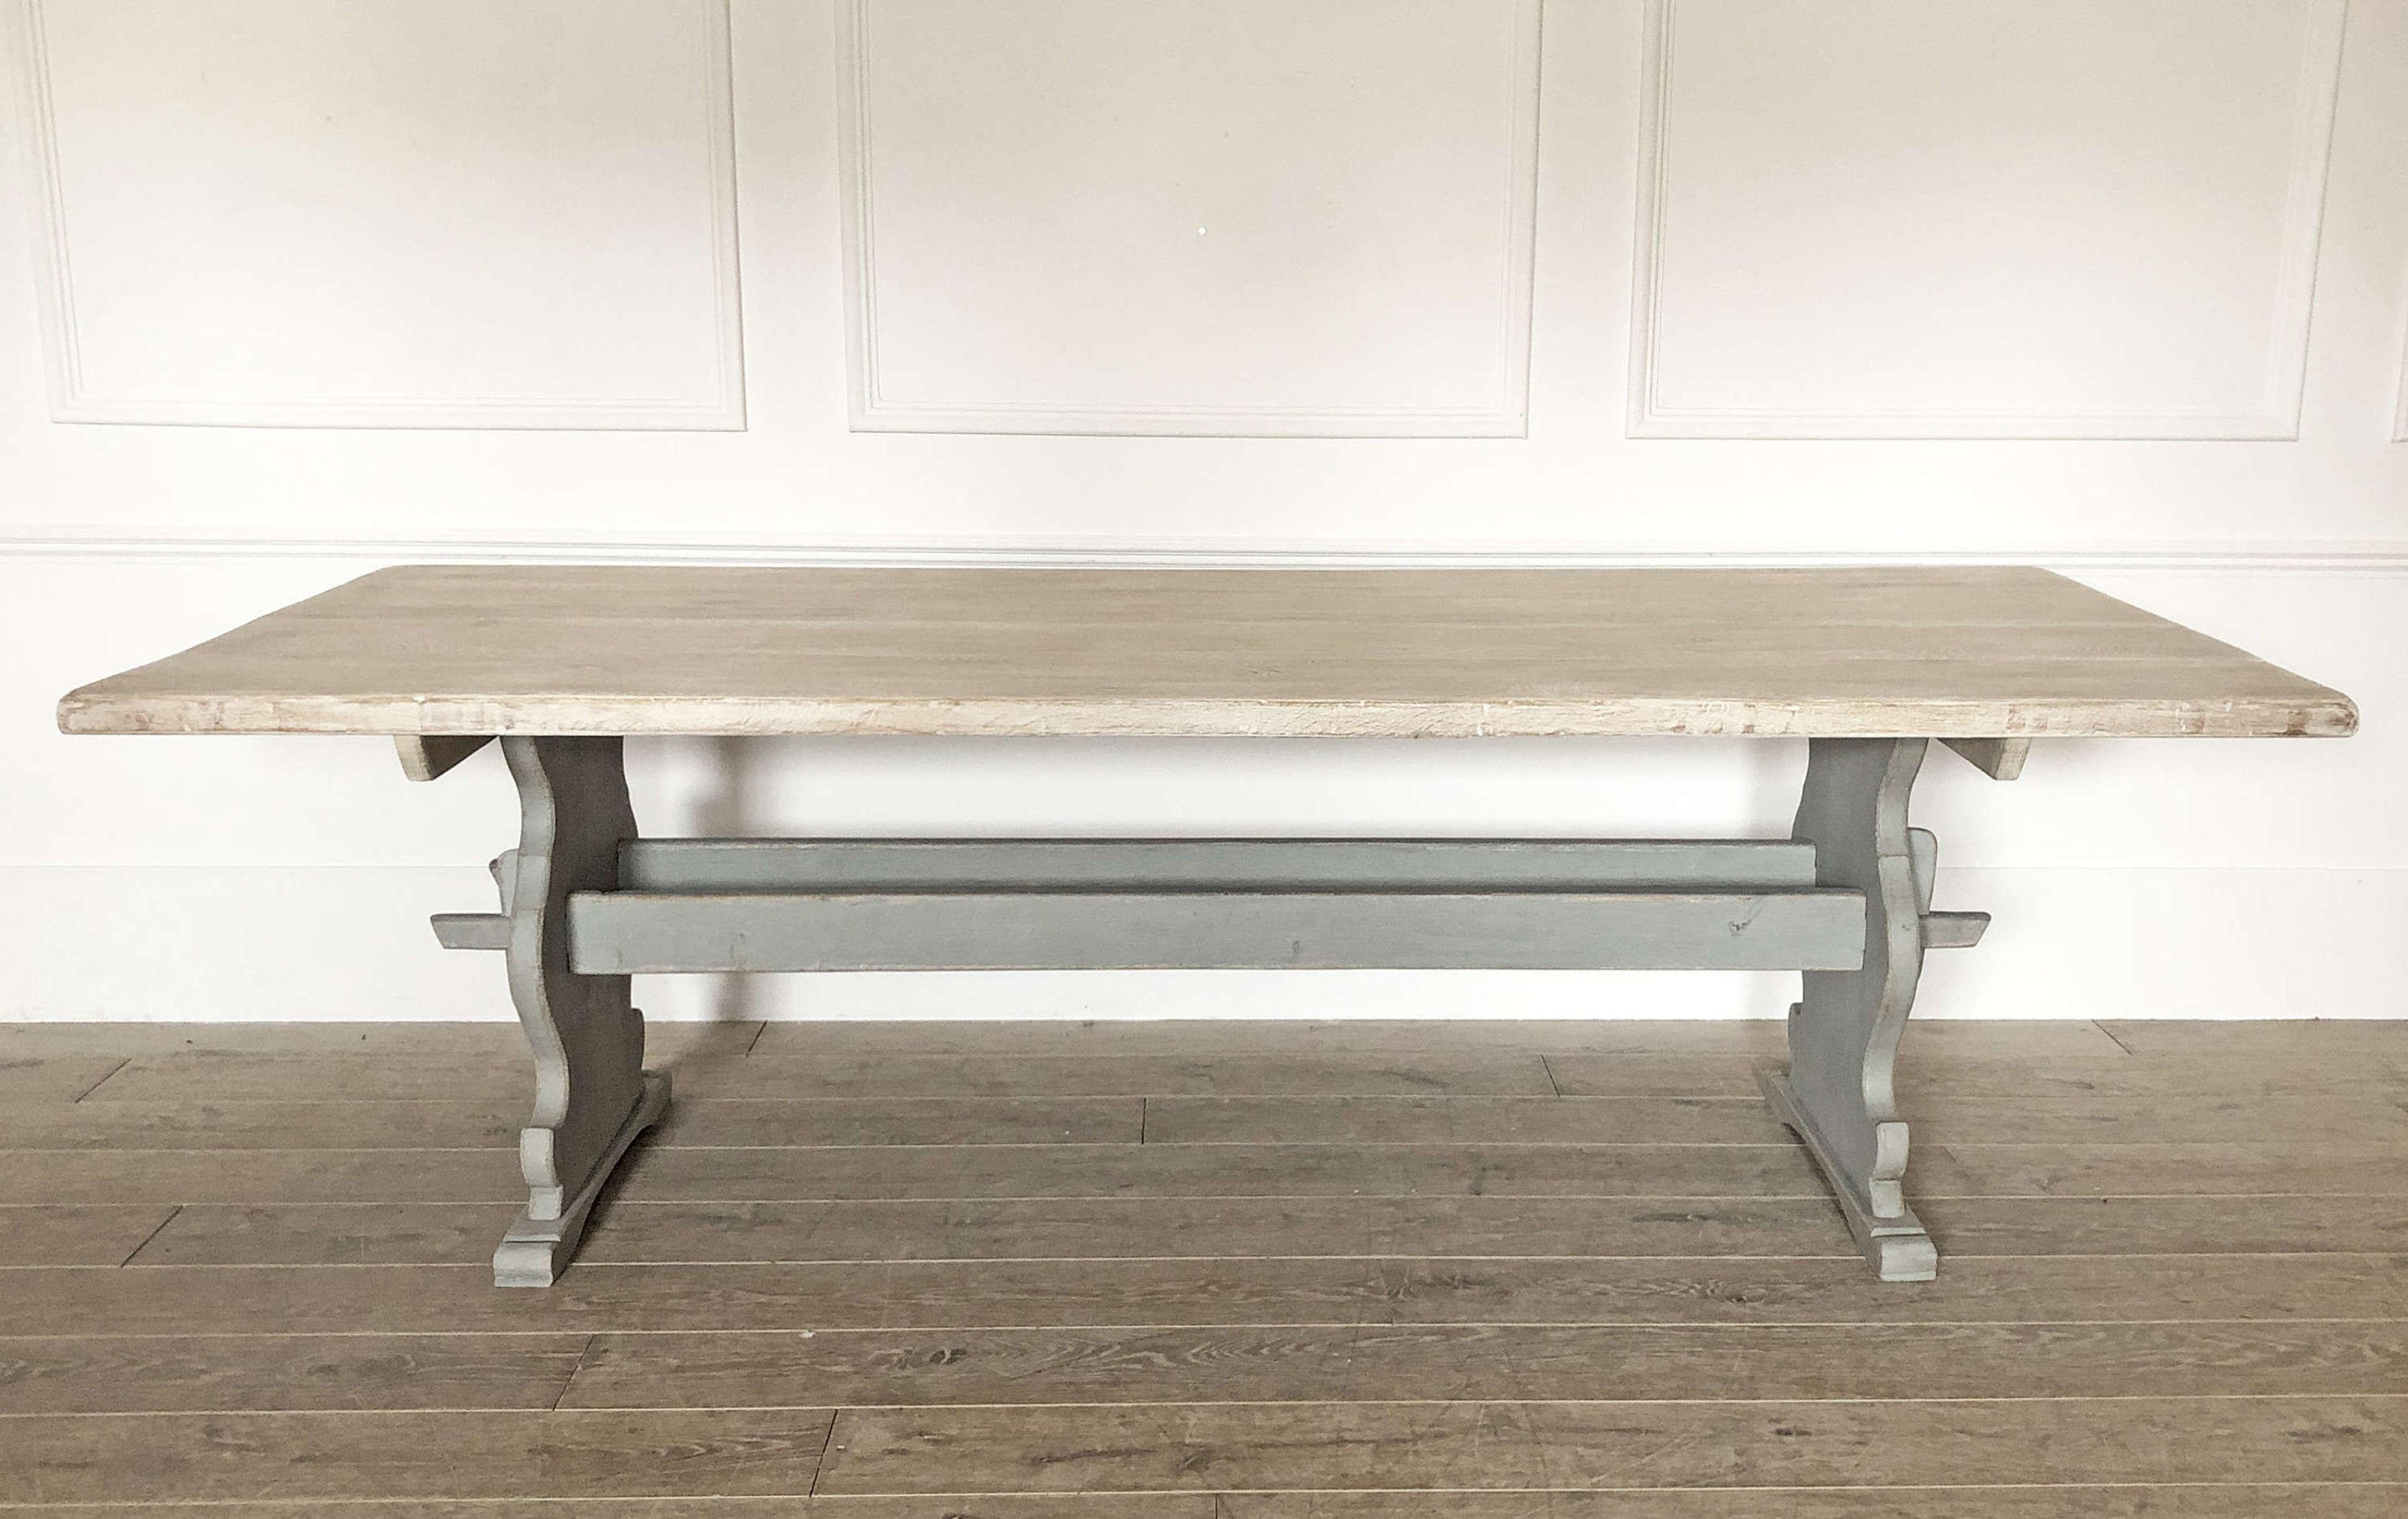 19thc Swedish long Oak Dining Table on double stretcher base c 1850